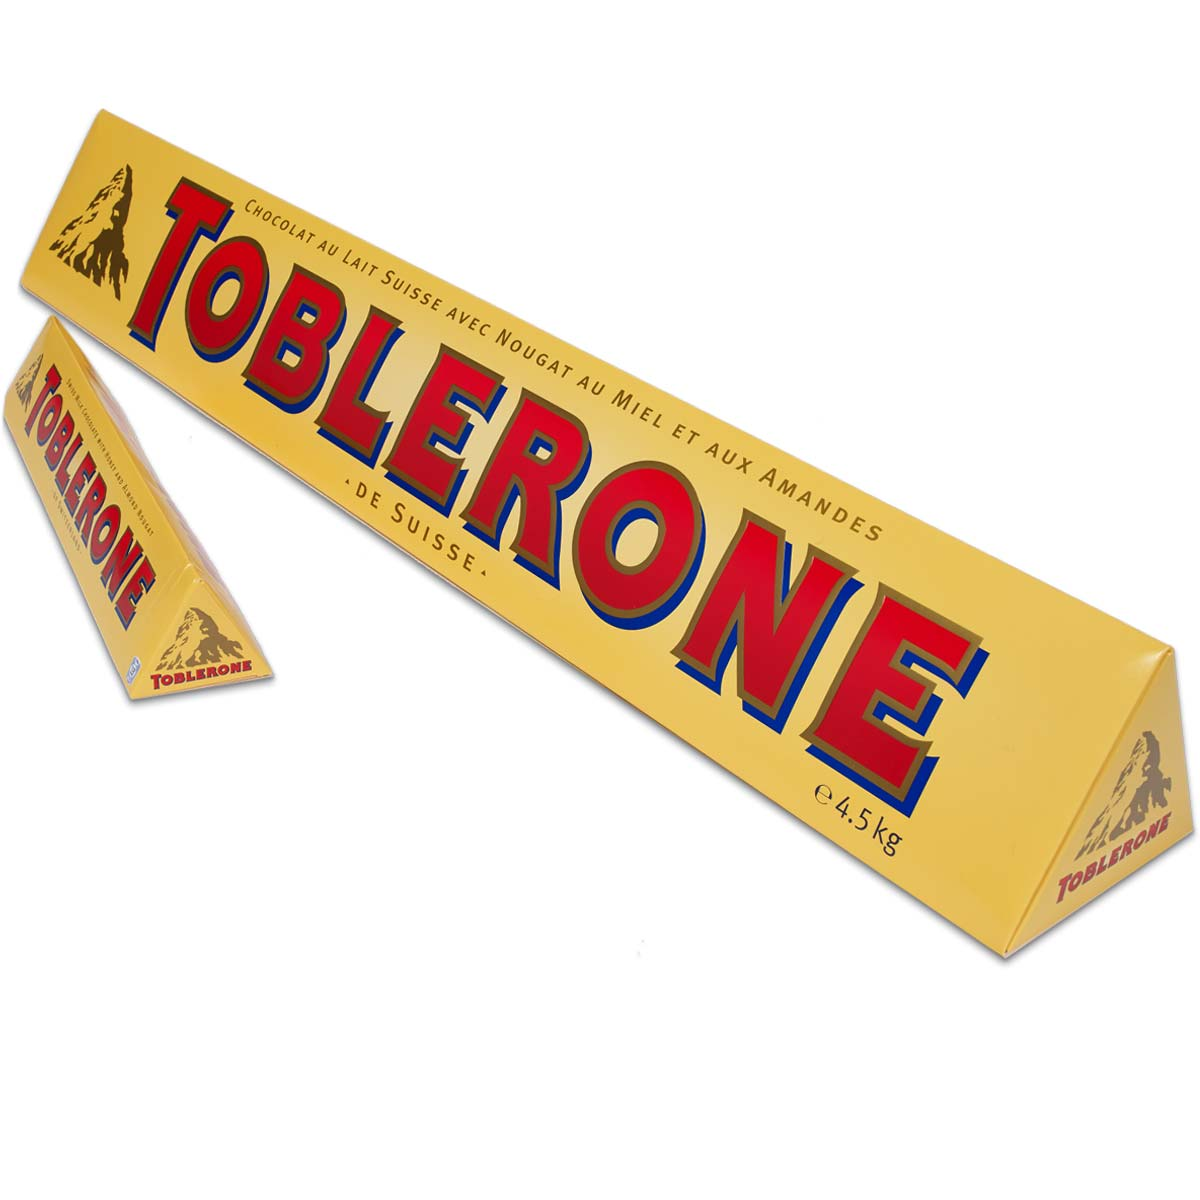 Toblerone Giant 4.5kg Bar